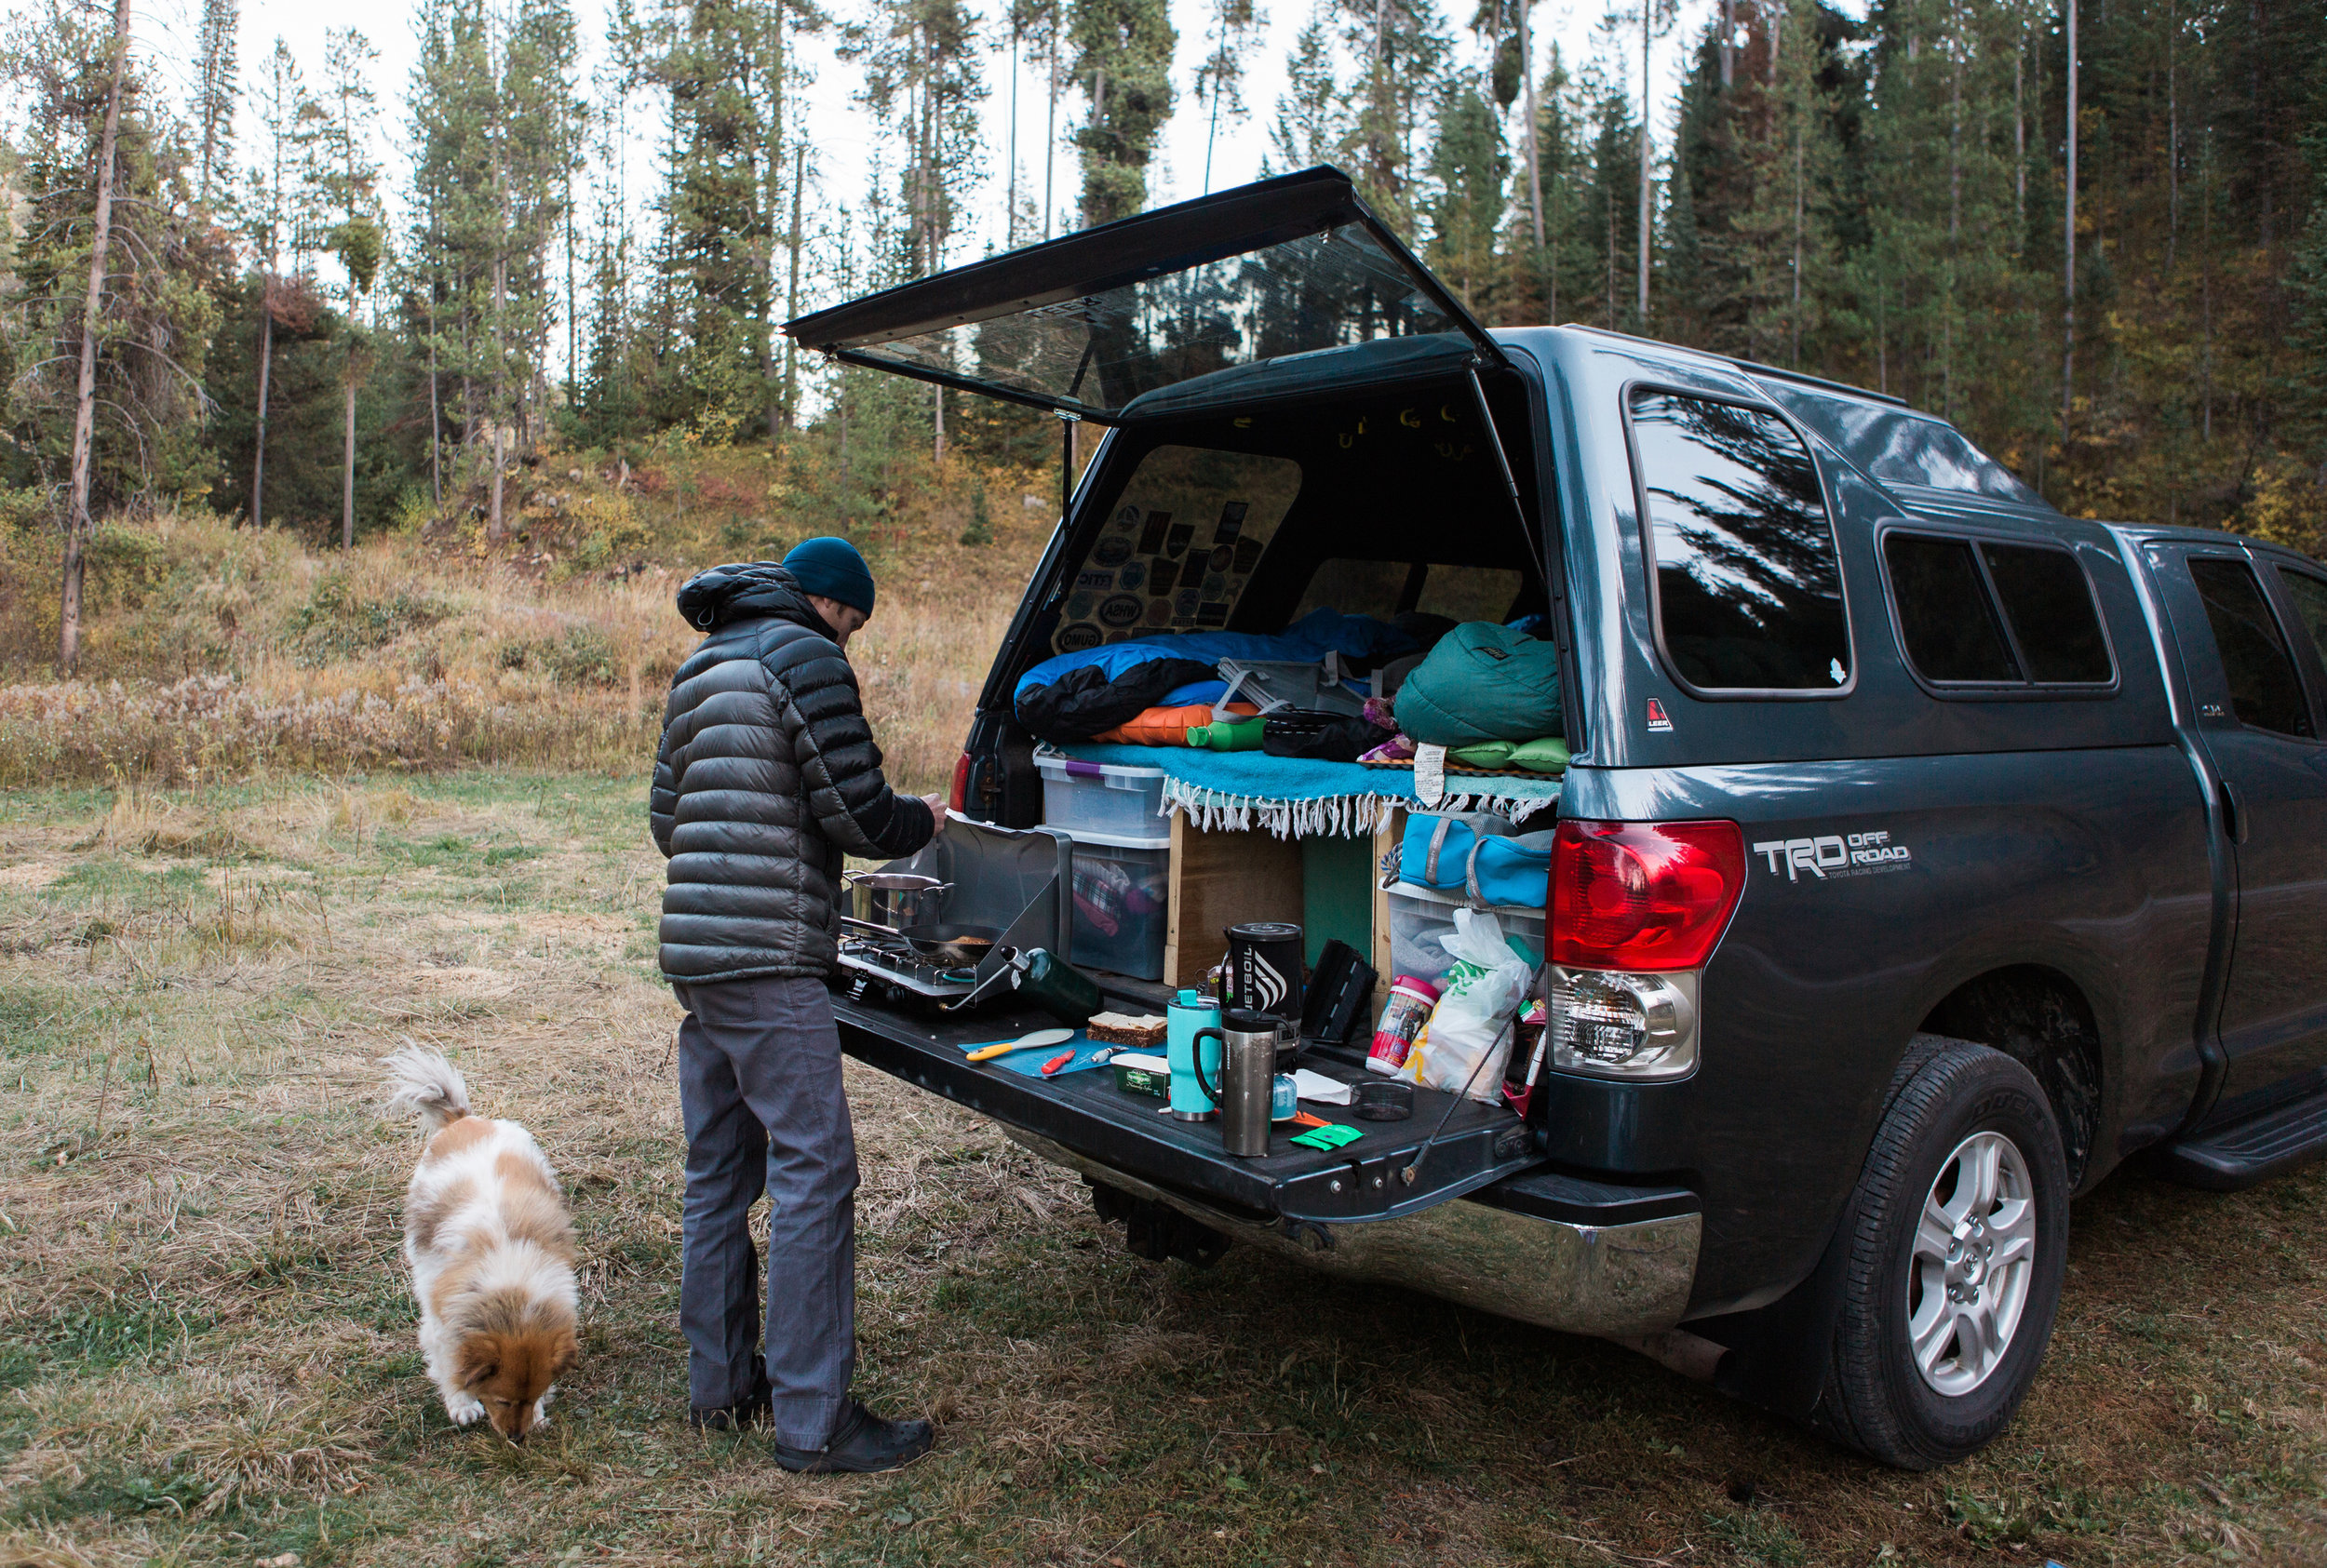 CindyGiovagnoli_outdoor_adventure_photography_Grand_Teton_Yellowstone_Glacier_National_Park_Montana_Wyoming_South_Dakota_Mount_Rushmore_Badlands-024.jpg